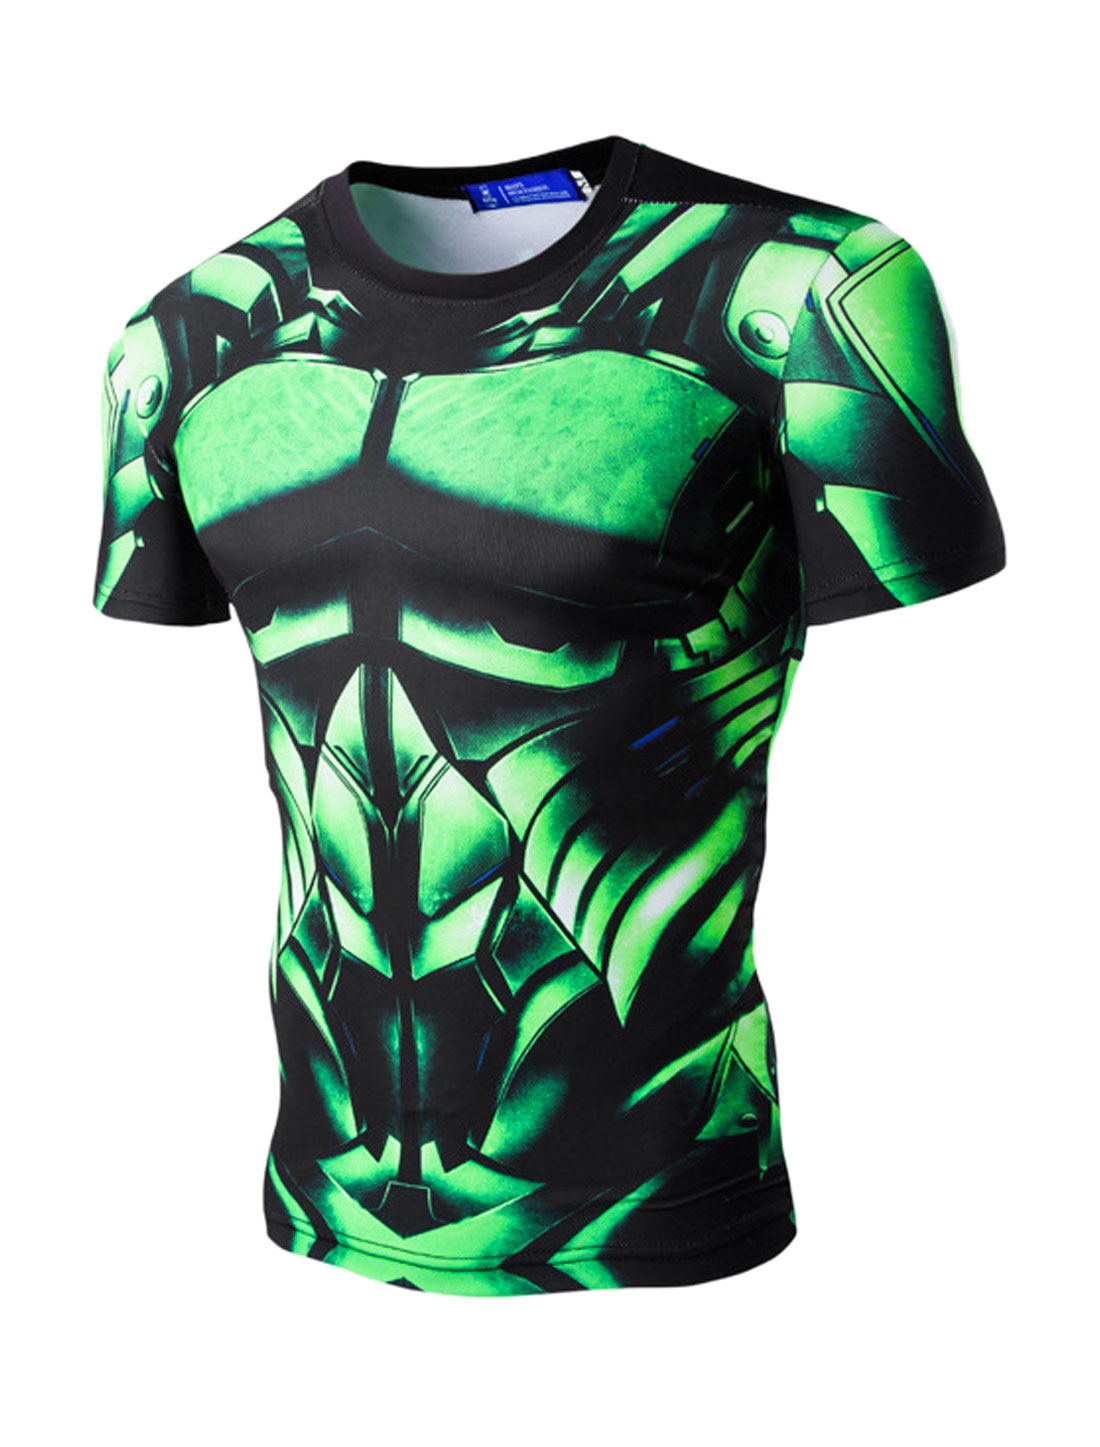 Men Short Sleeves Crew Neck Slim Fit Armor Printed T-Shirt Green M